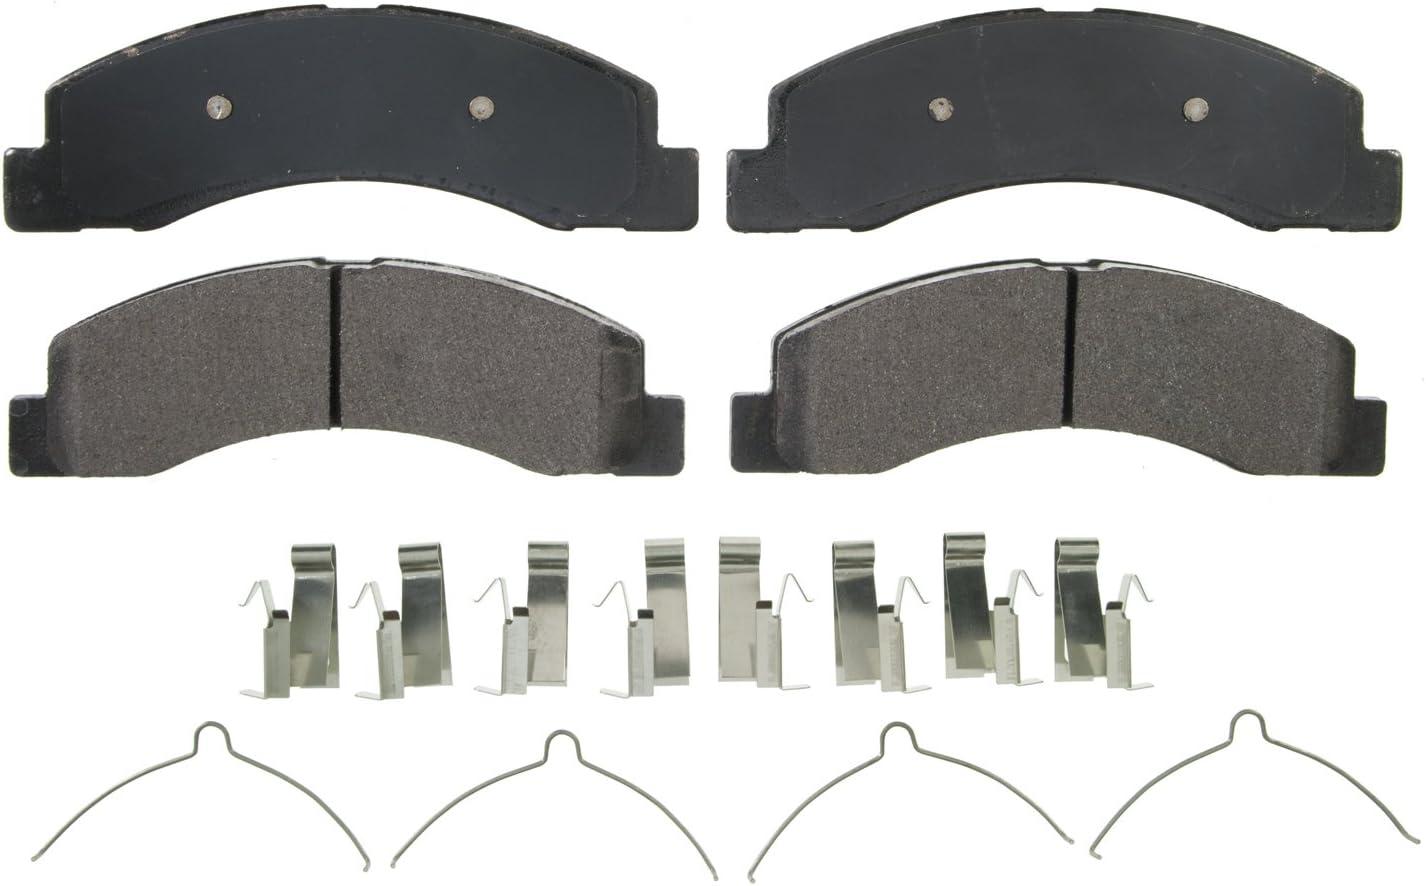 TOYOTA Genuine 71511-33090 Seat Cushion Pad